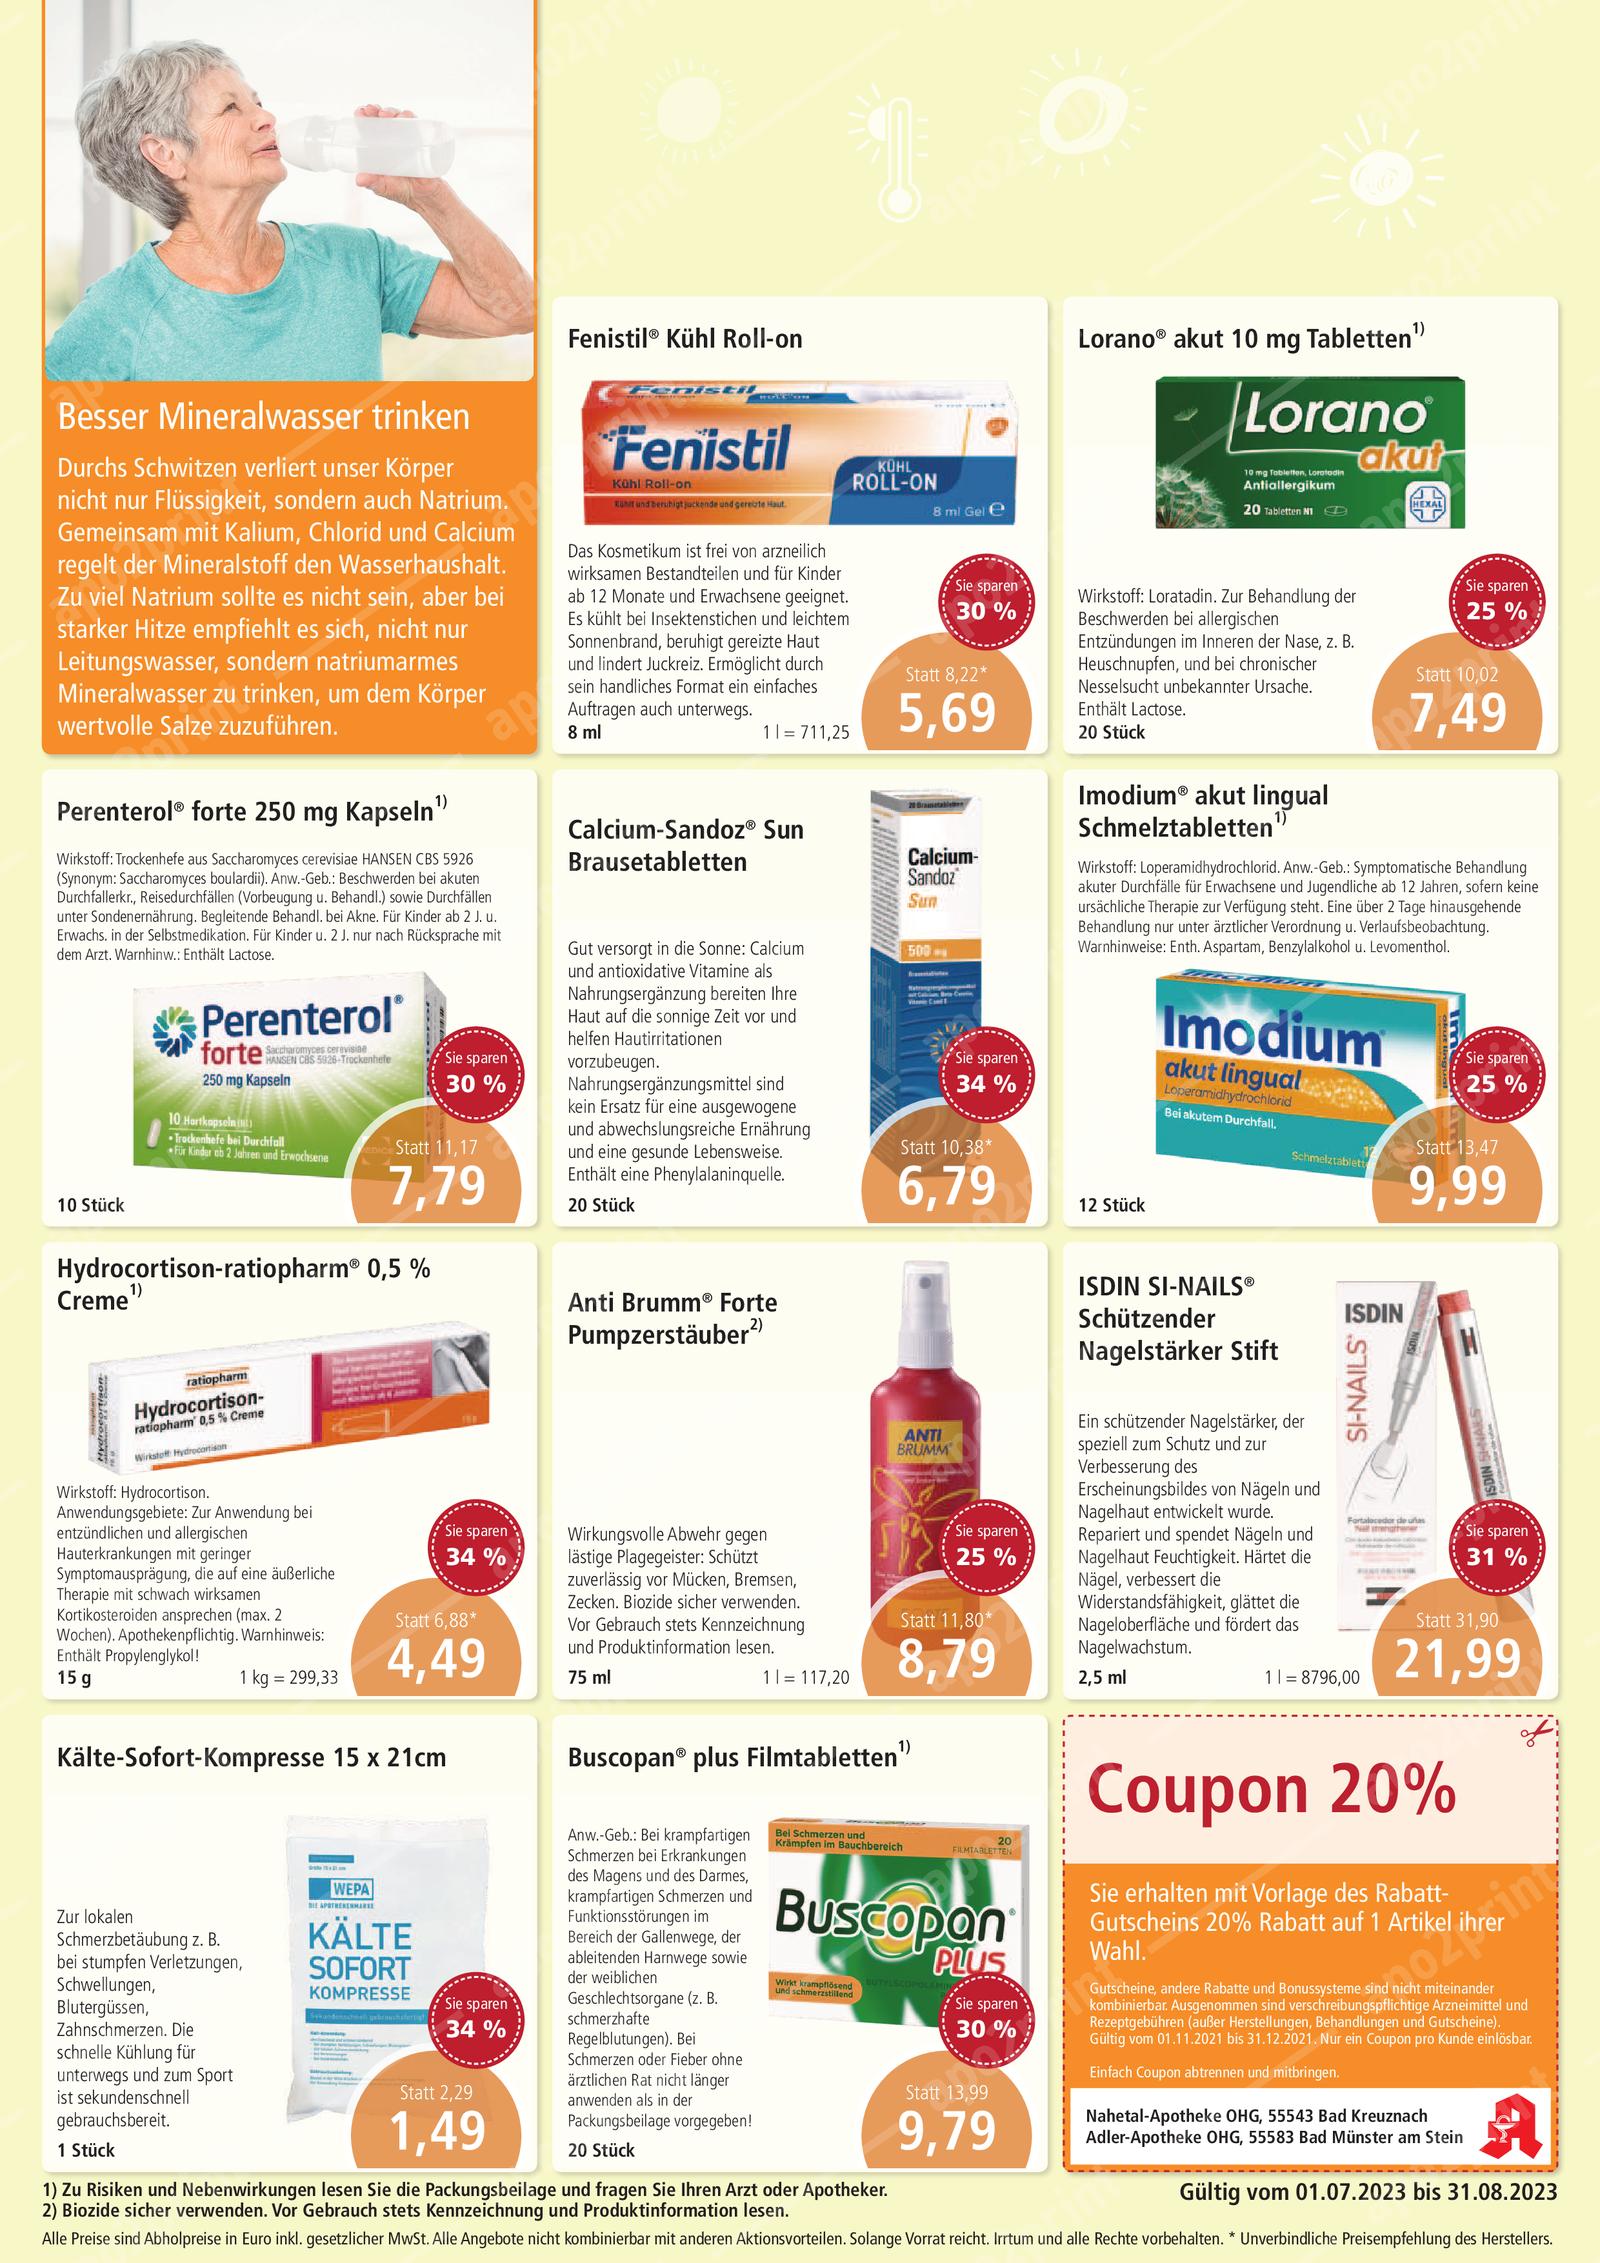 https://mein-uploads.apocdn.net/29858/leaflets/29858_flyer-Seite2.png